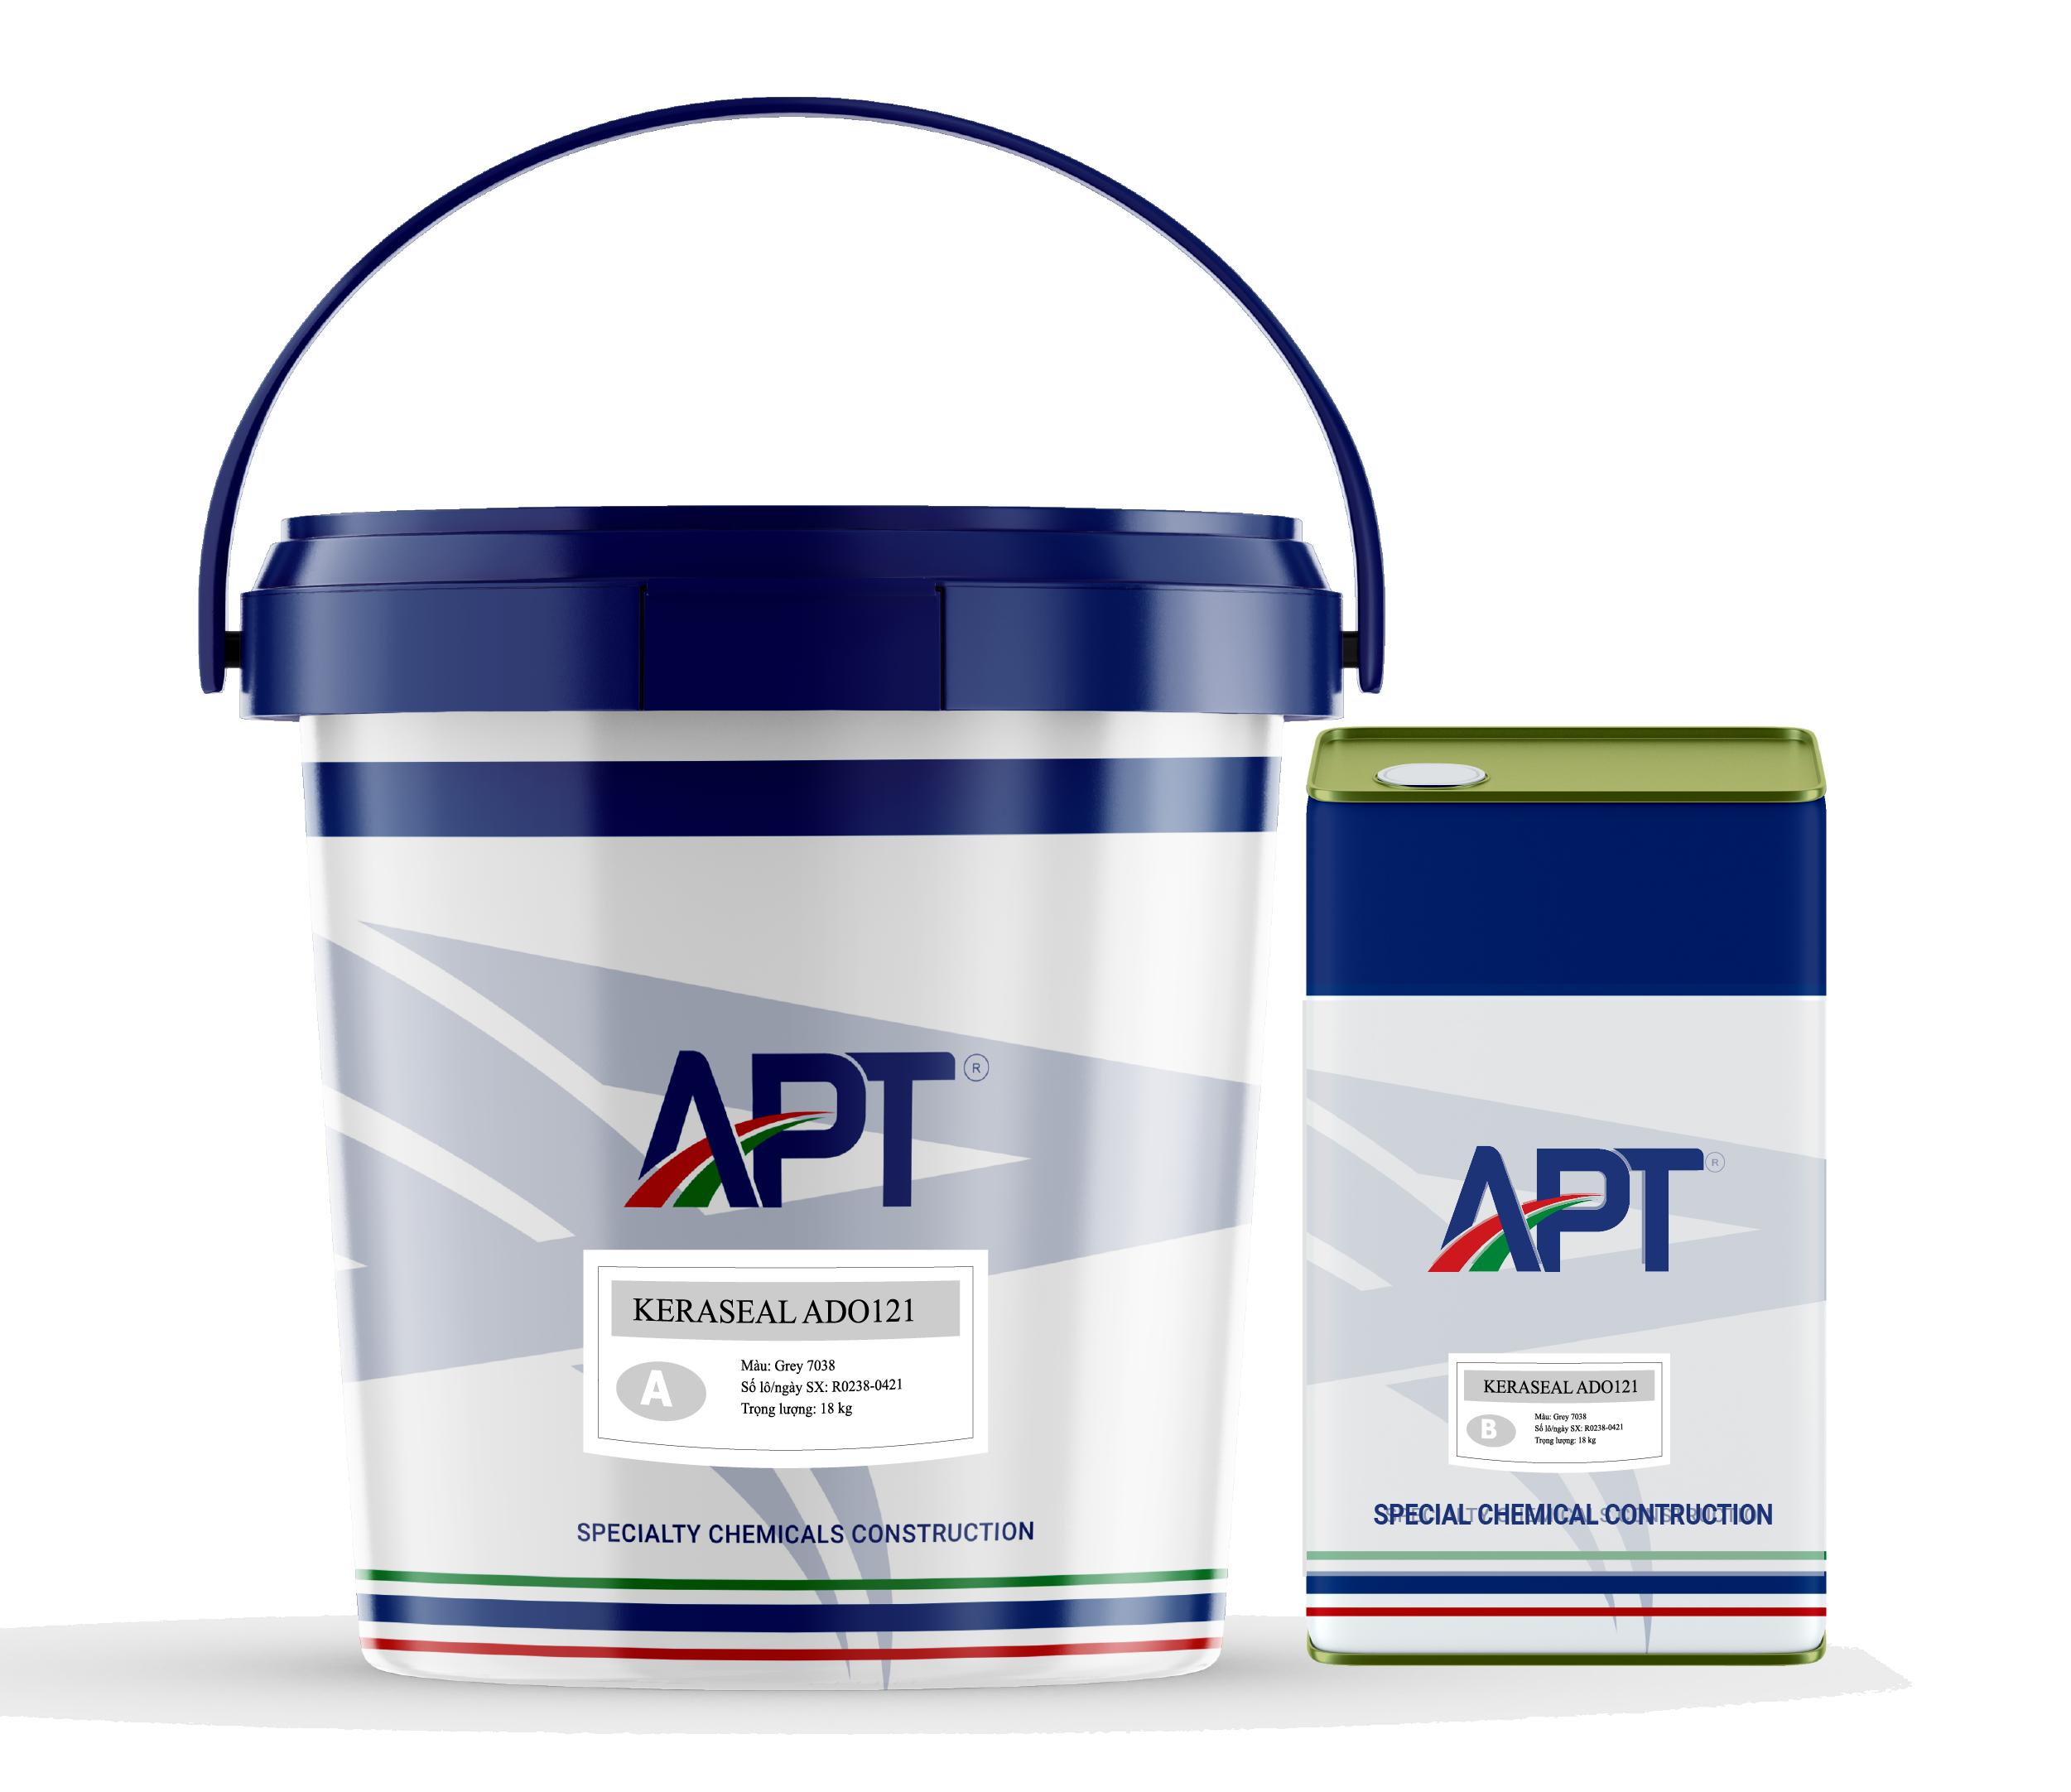 Solvent-free epoxy coating system KERASEAL ADO122